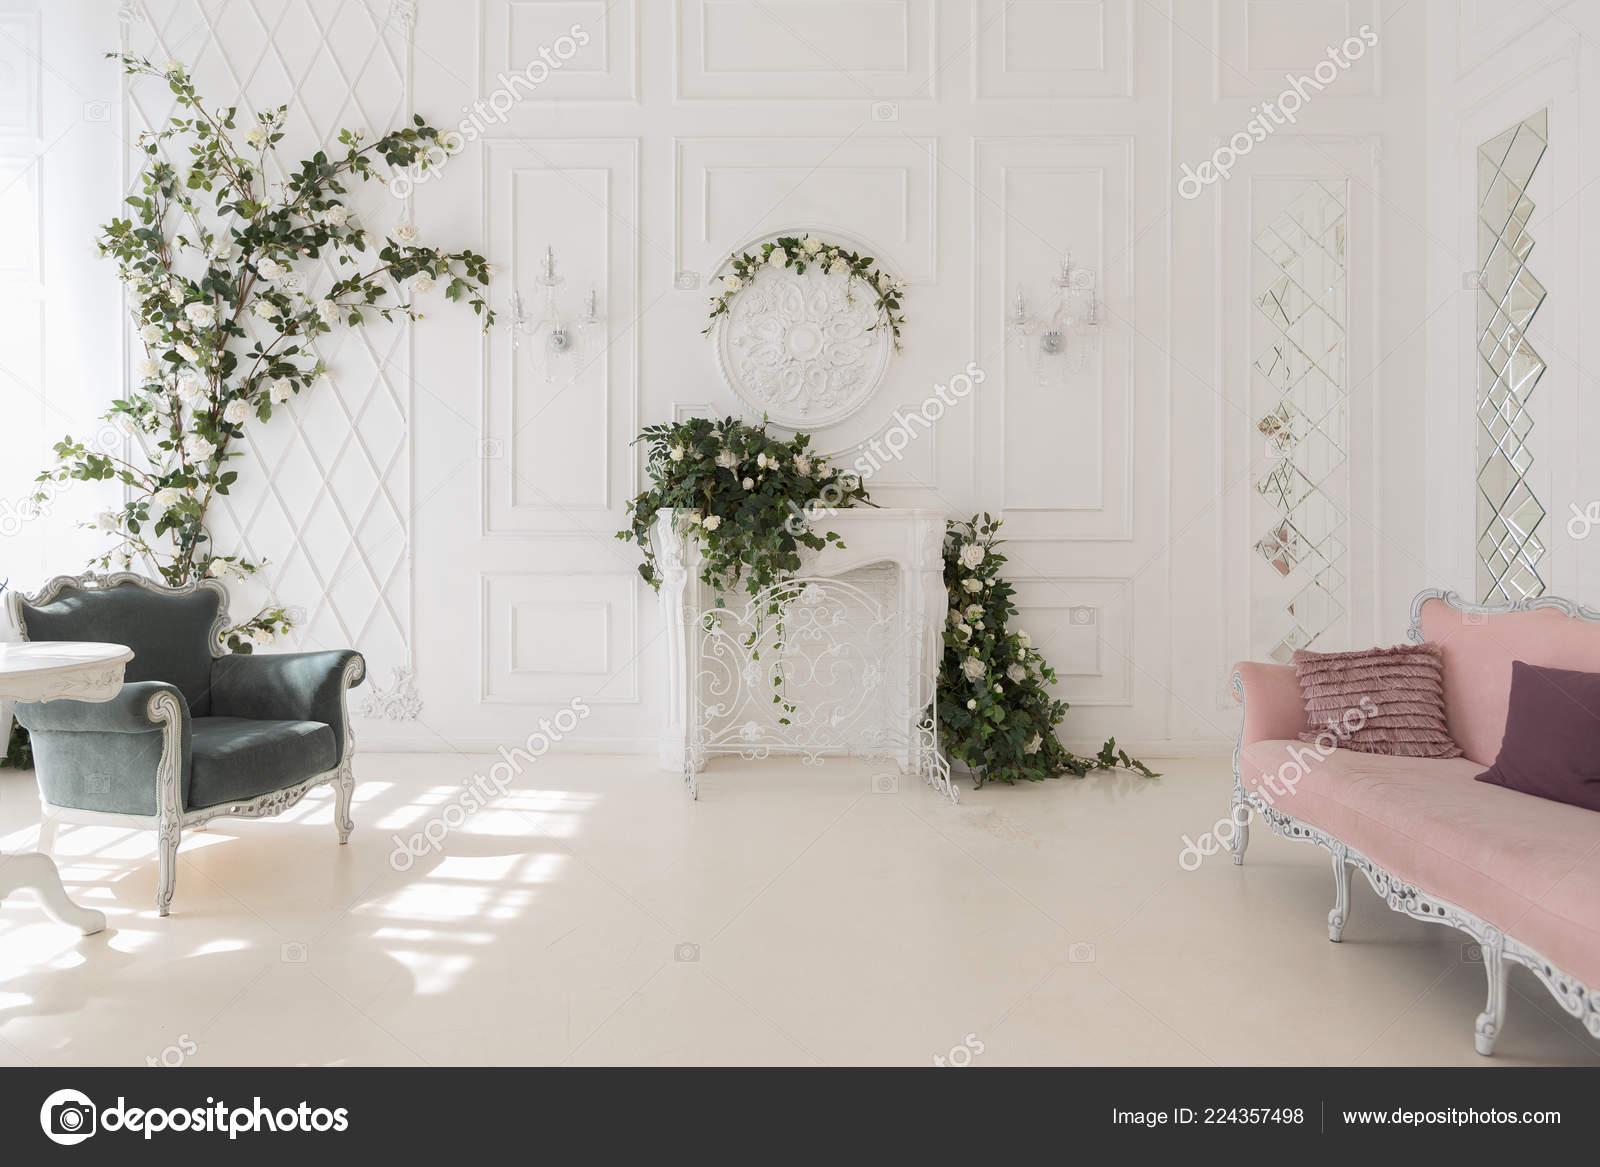 Luxury Rich Interior Design Elegant Vintage Furniture Floral Decorations Stock Photo C Nokia Alexnet 224357498